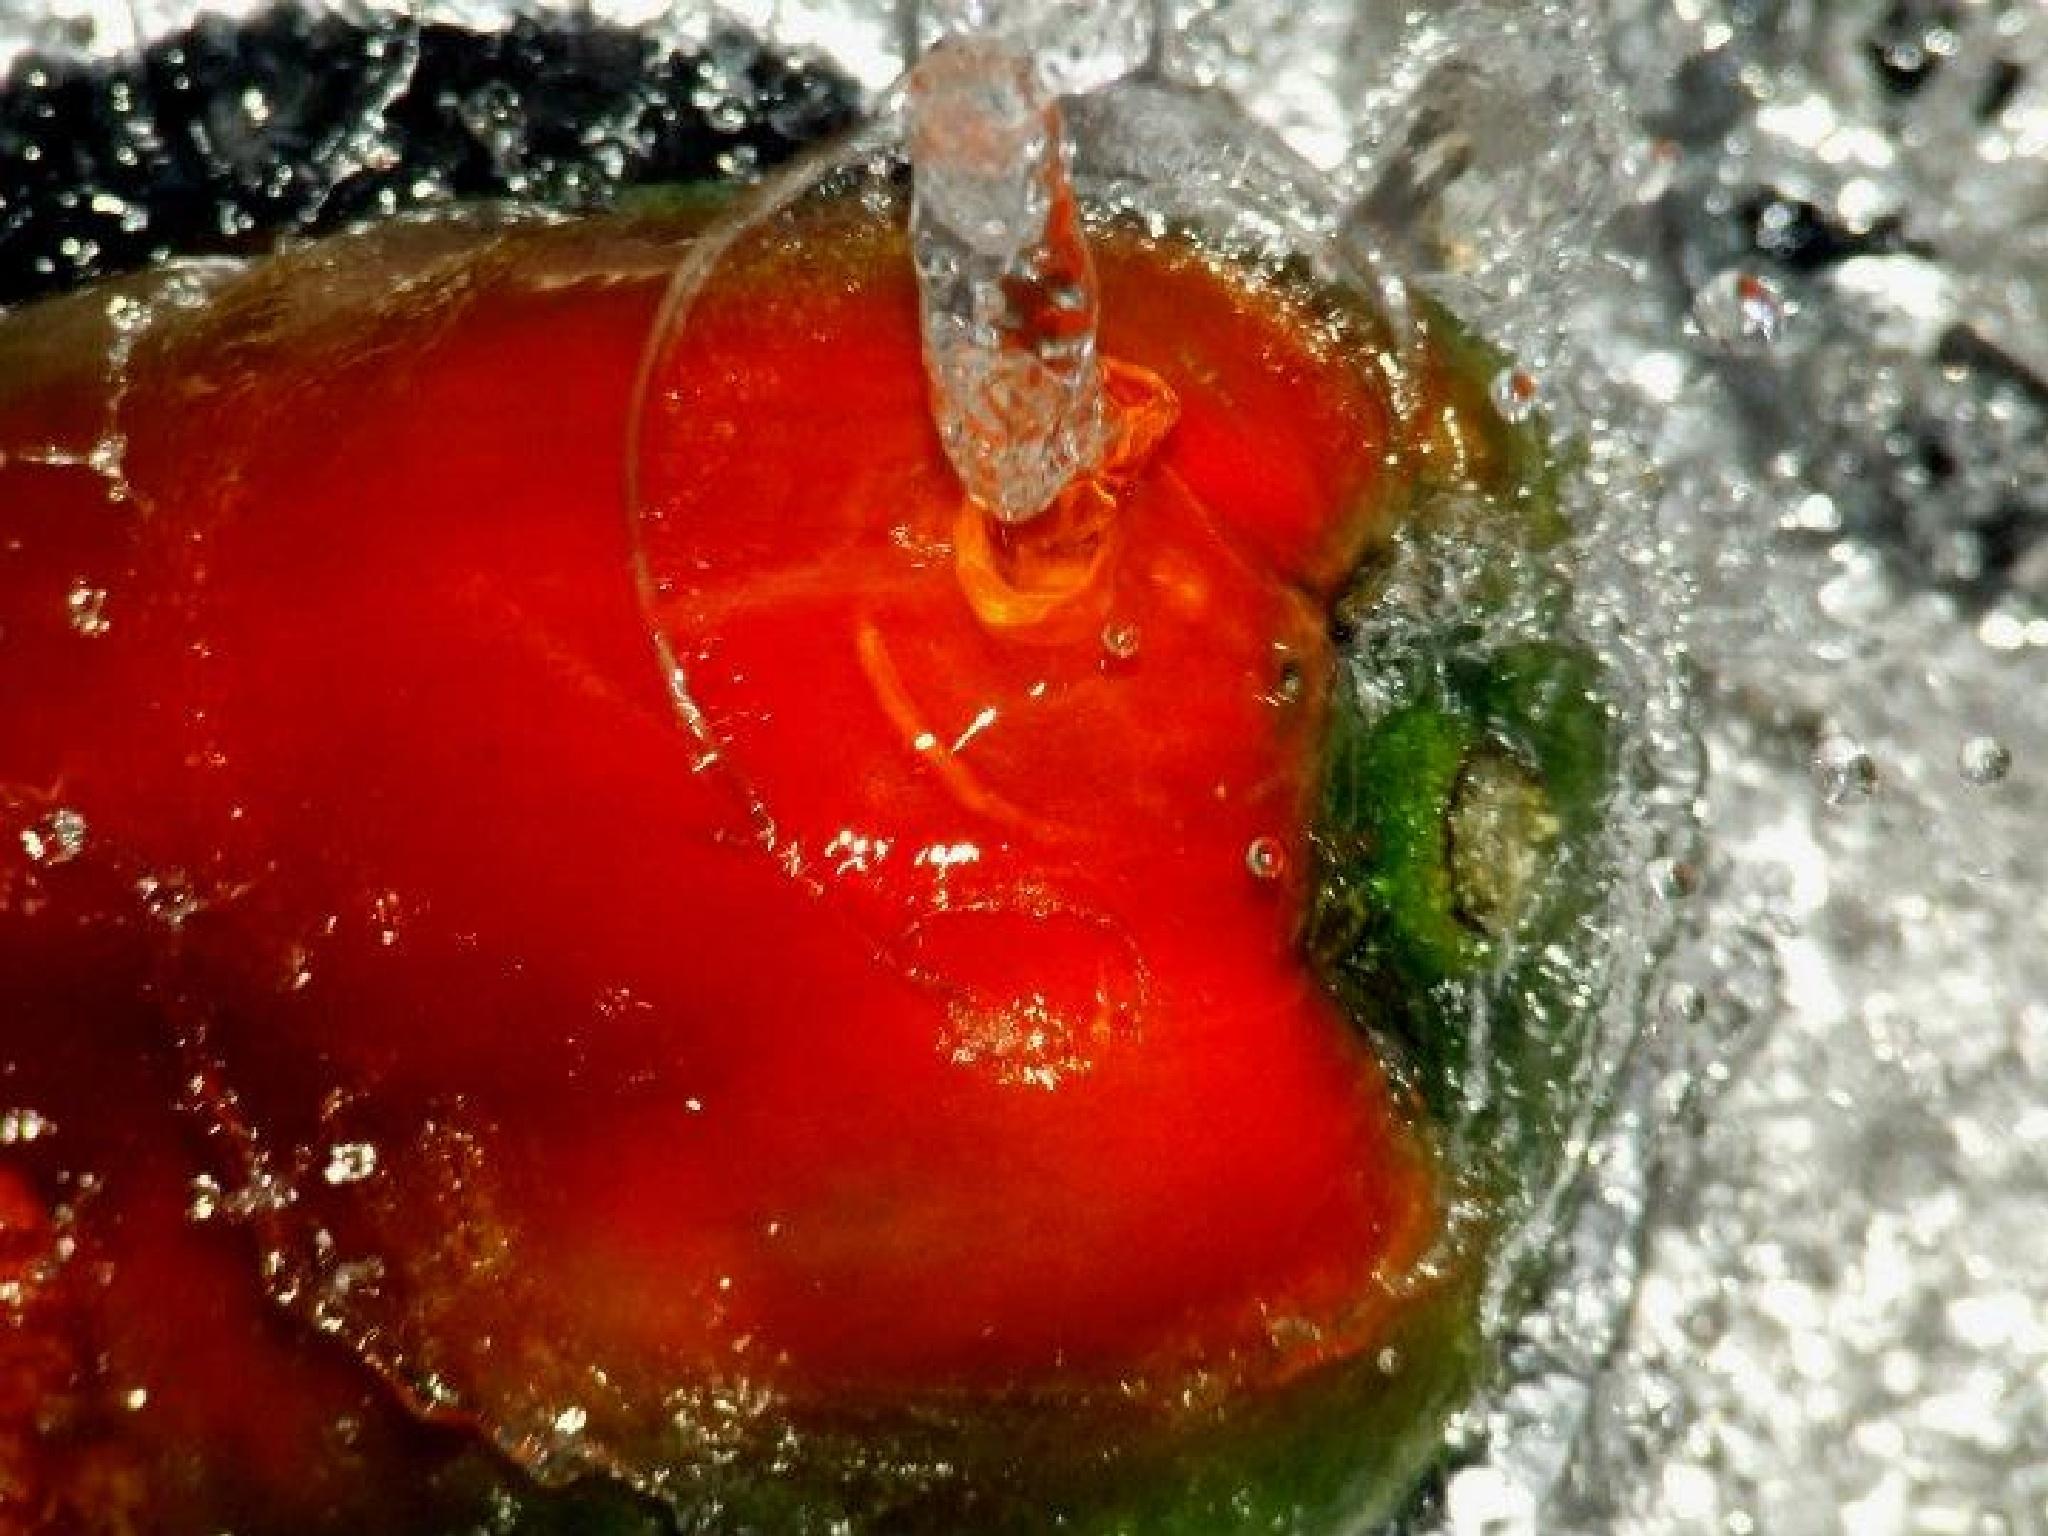 Red pepper by vivianafrazzetto